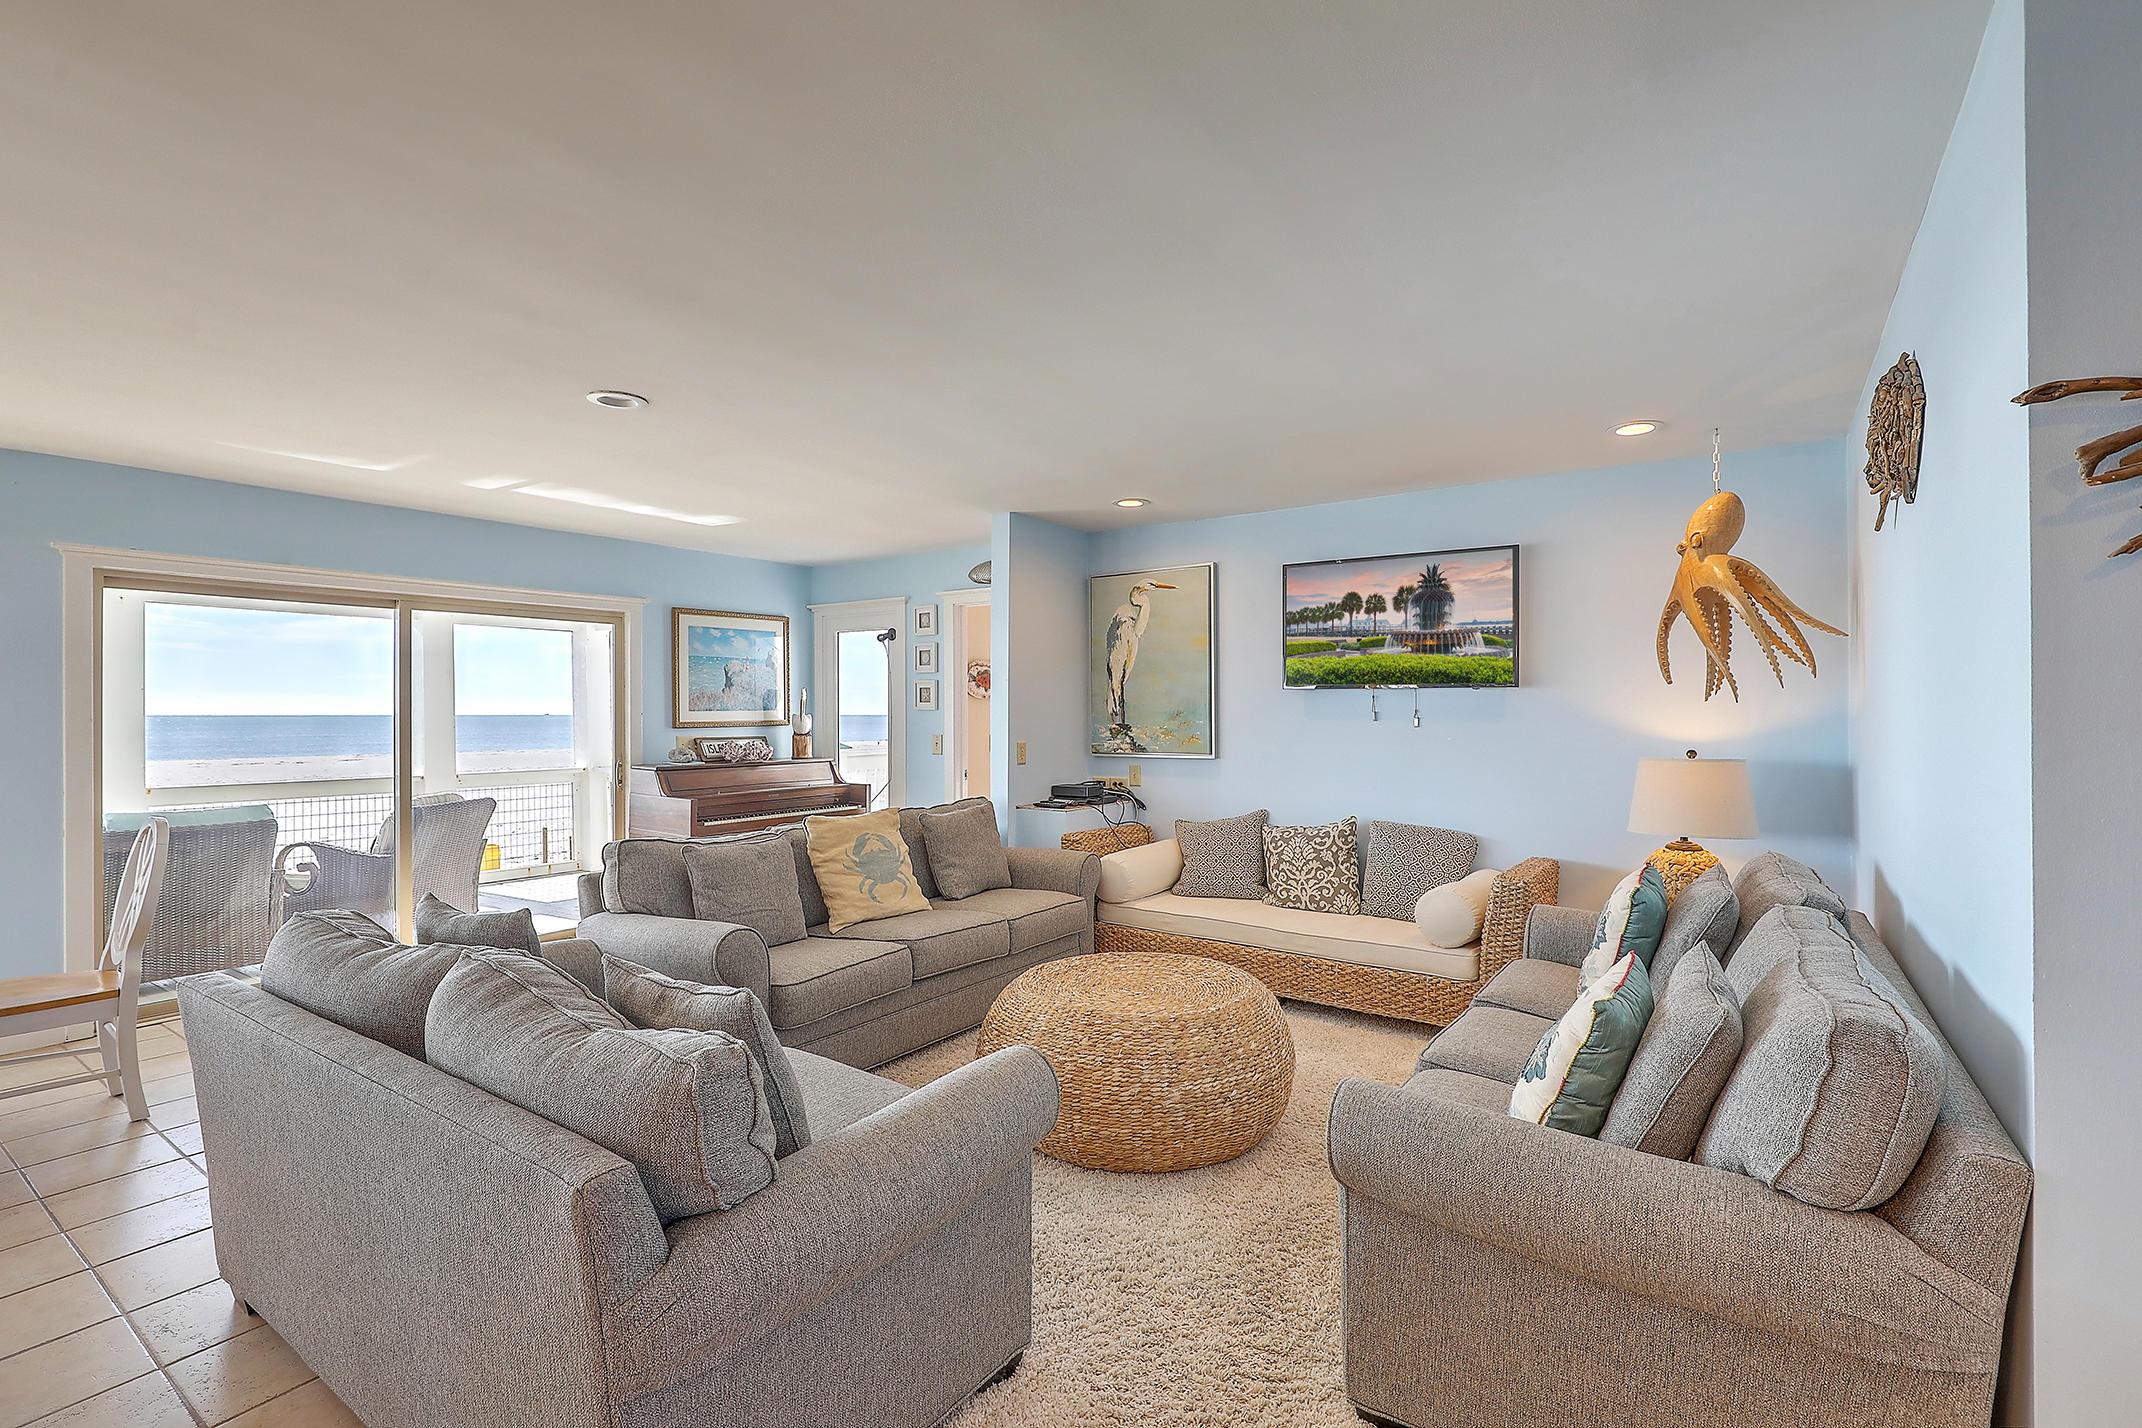 Wild Dunes Homes For Sale - 14 Beachwood East, Isle of Palms, SC - 16